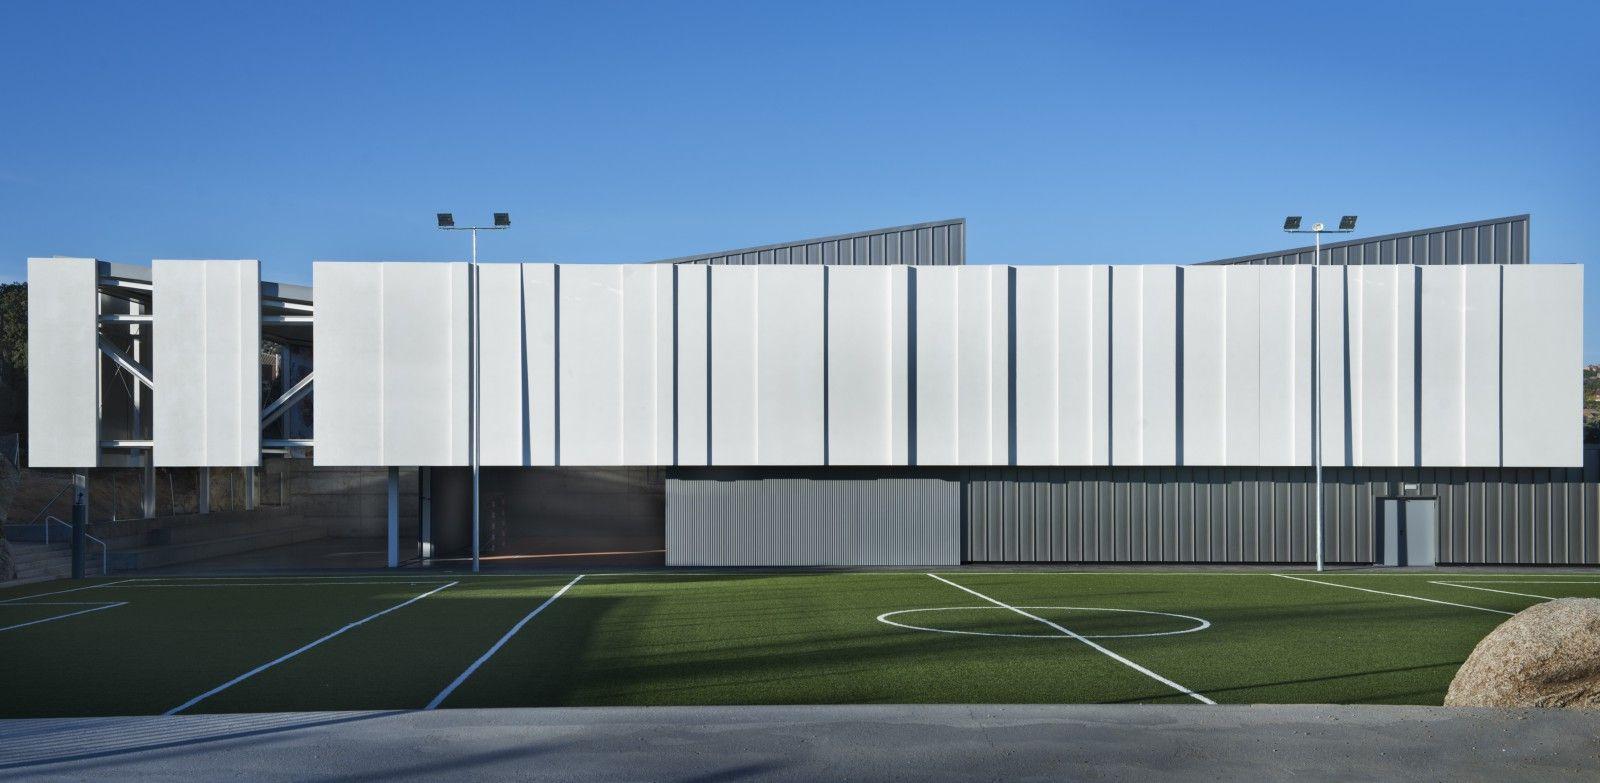 Pabell n de deportes u3 estudio de arquitectura madrid office building pinterest - Pabellon de deportes madrid ...